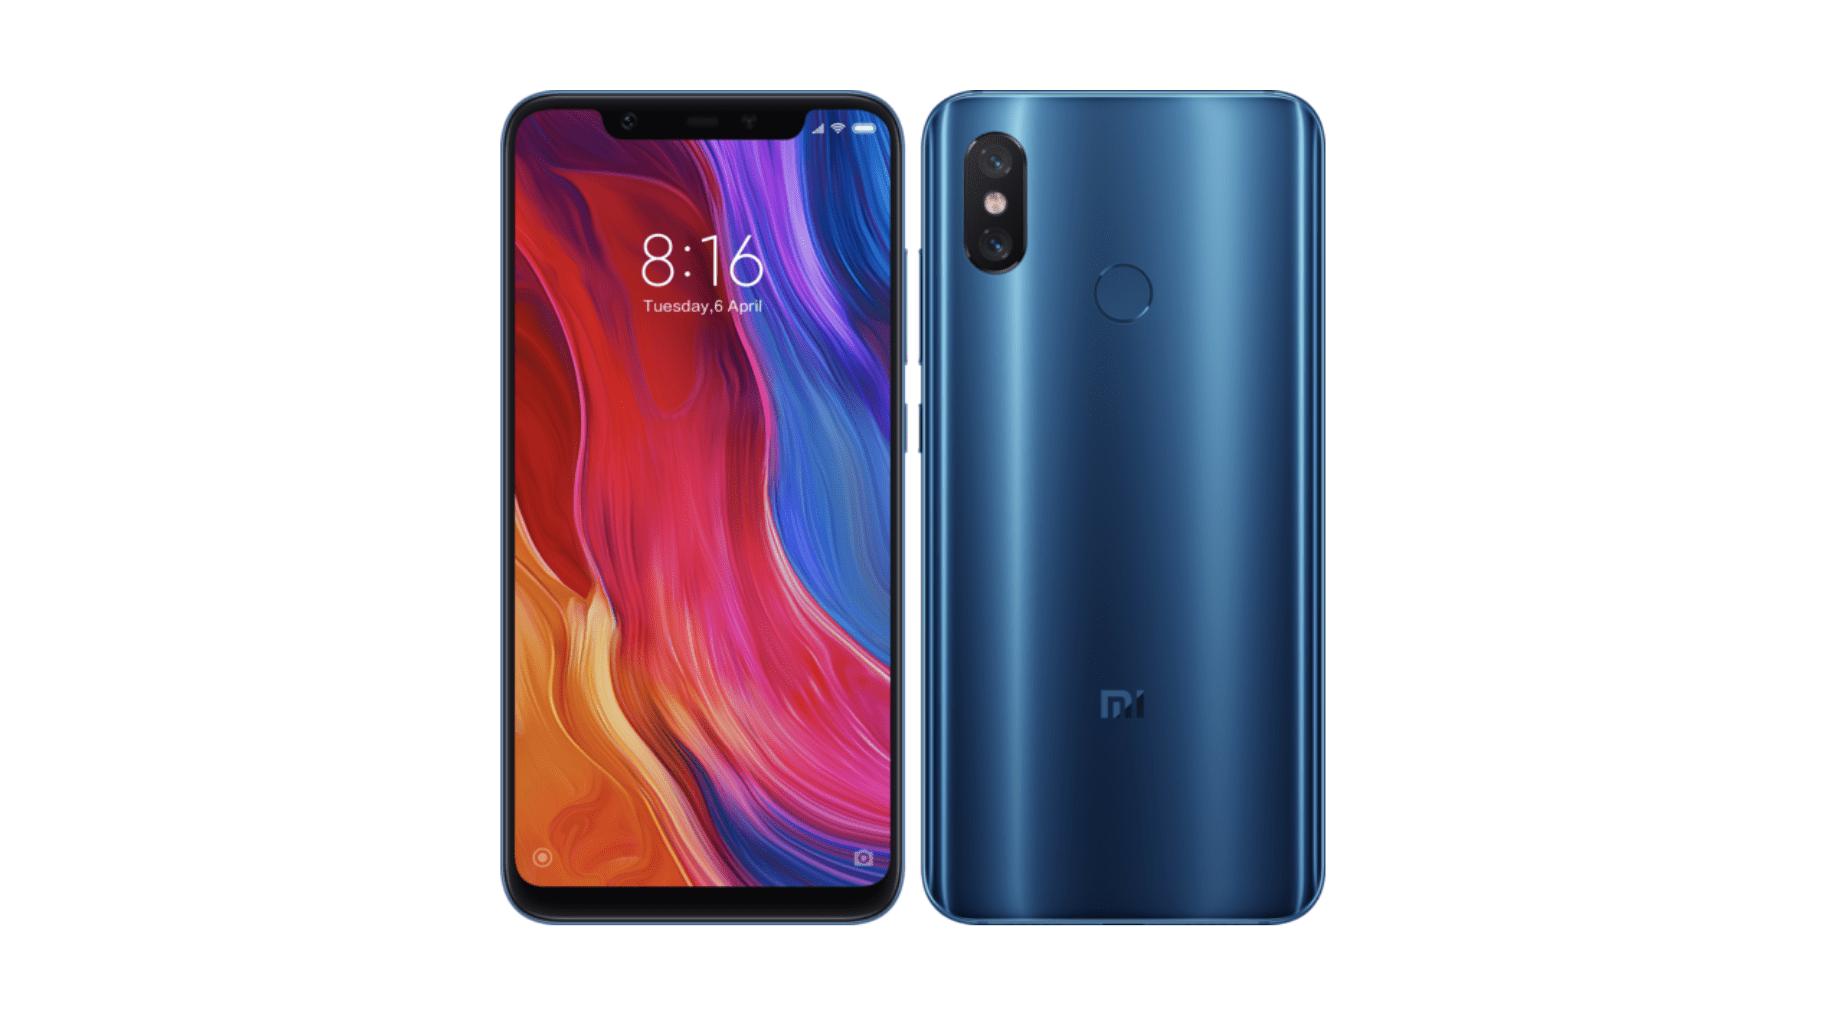 🔥 Bon plan : le Xiaomi Mi 8 à 345 euros au lieu de 499 euros